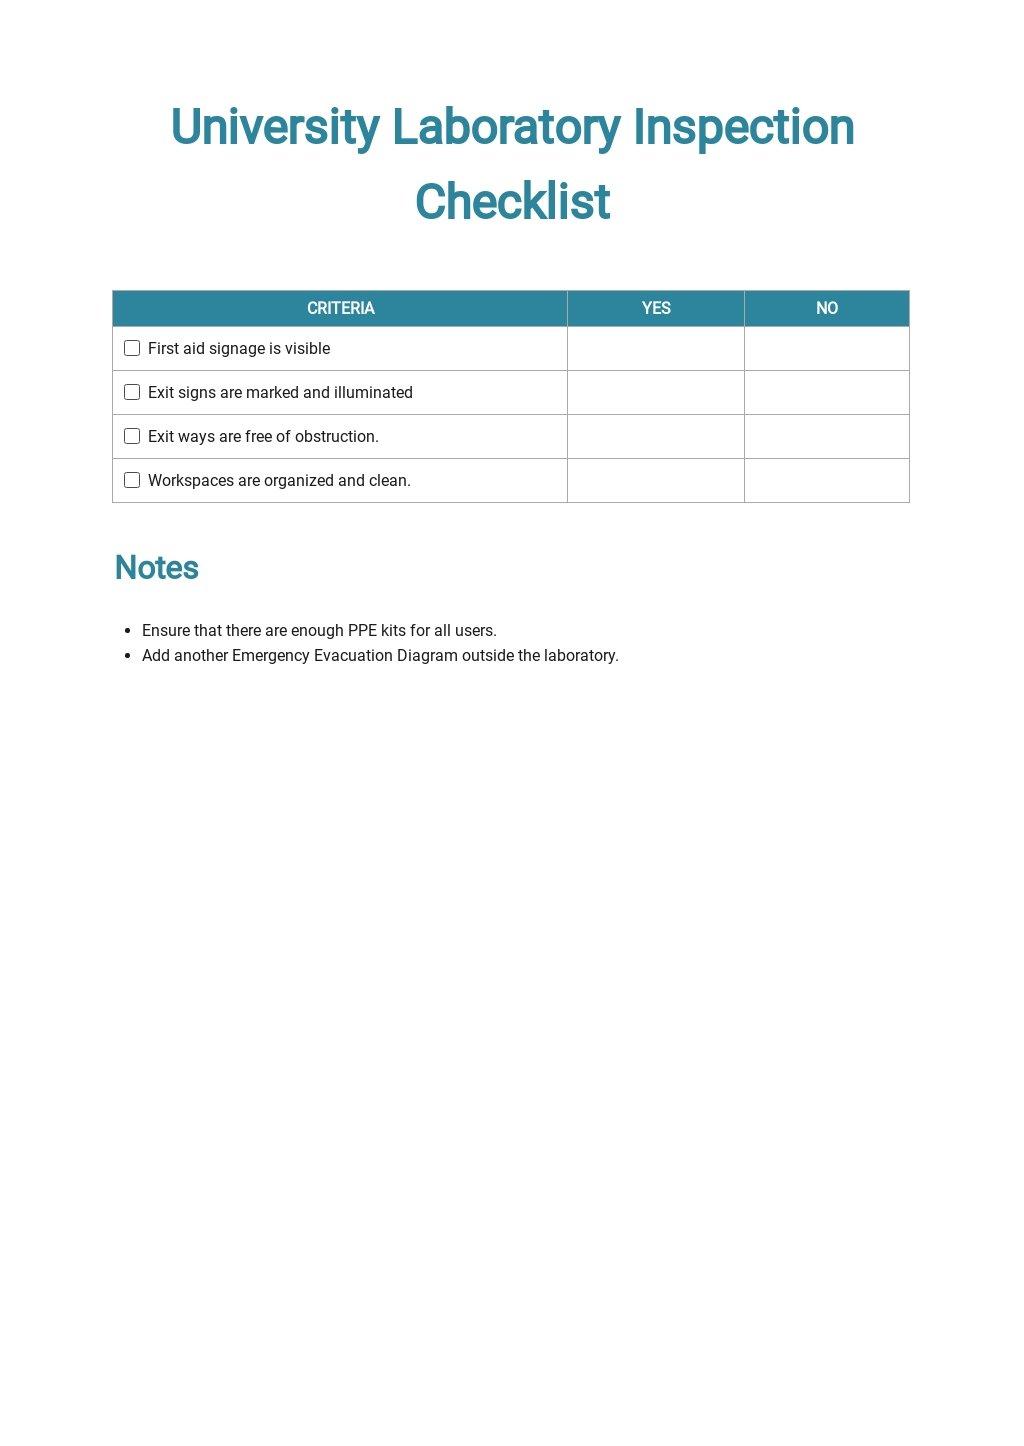 University Laboratory Inspection Checklist Template